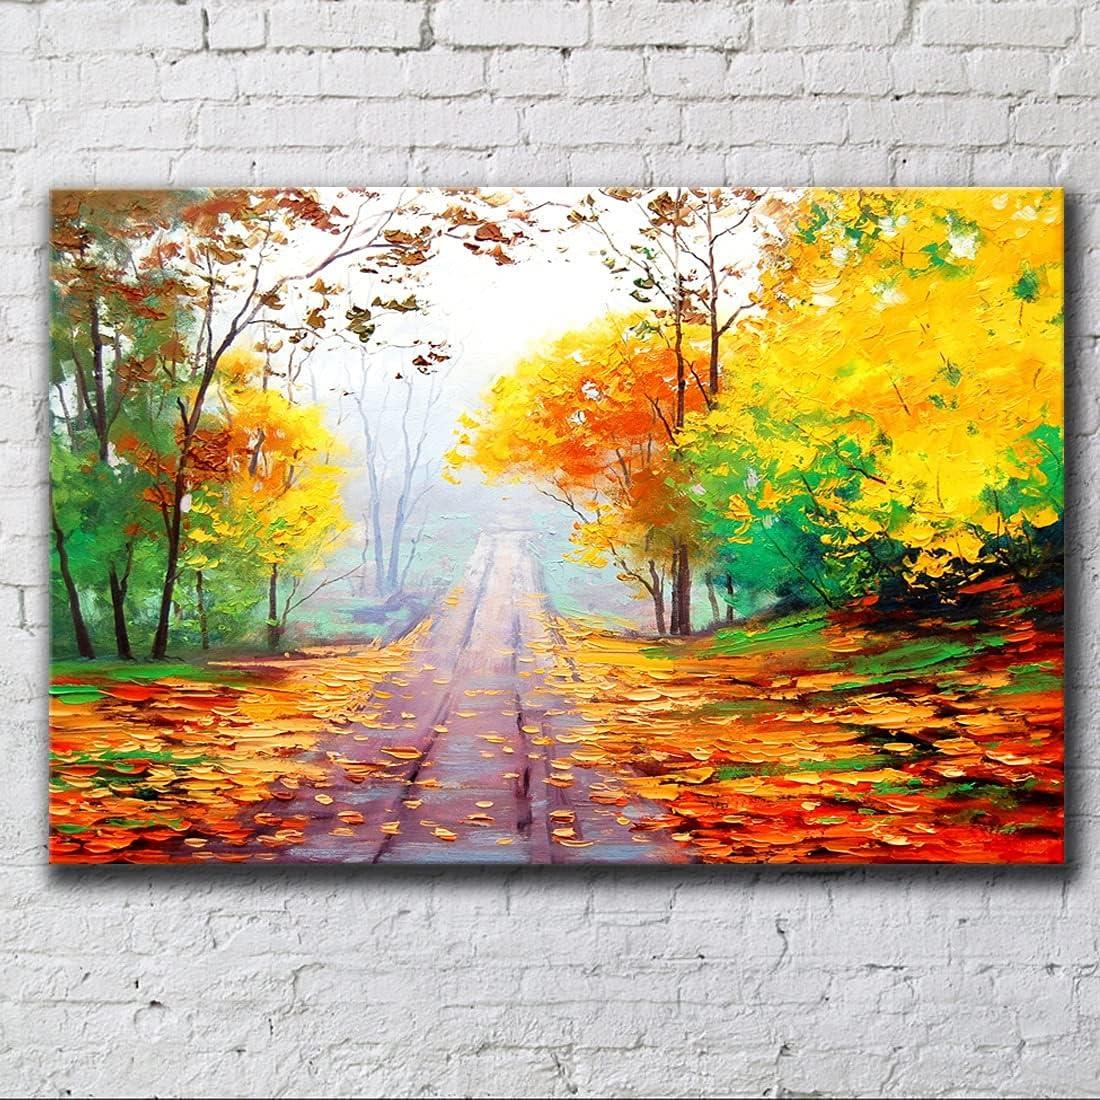 zxcvg Credence Grass Tree Landscape Waterproof Golden Autumn Painting quality assurance Oil